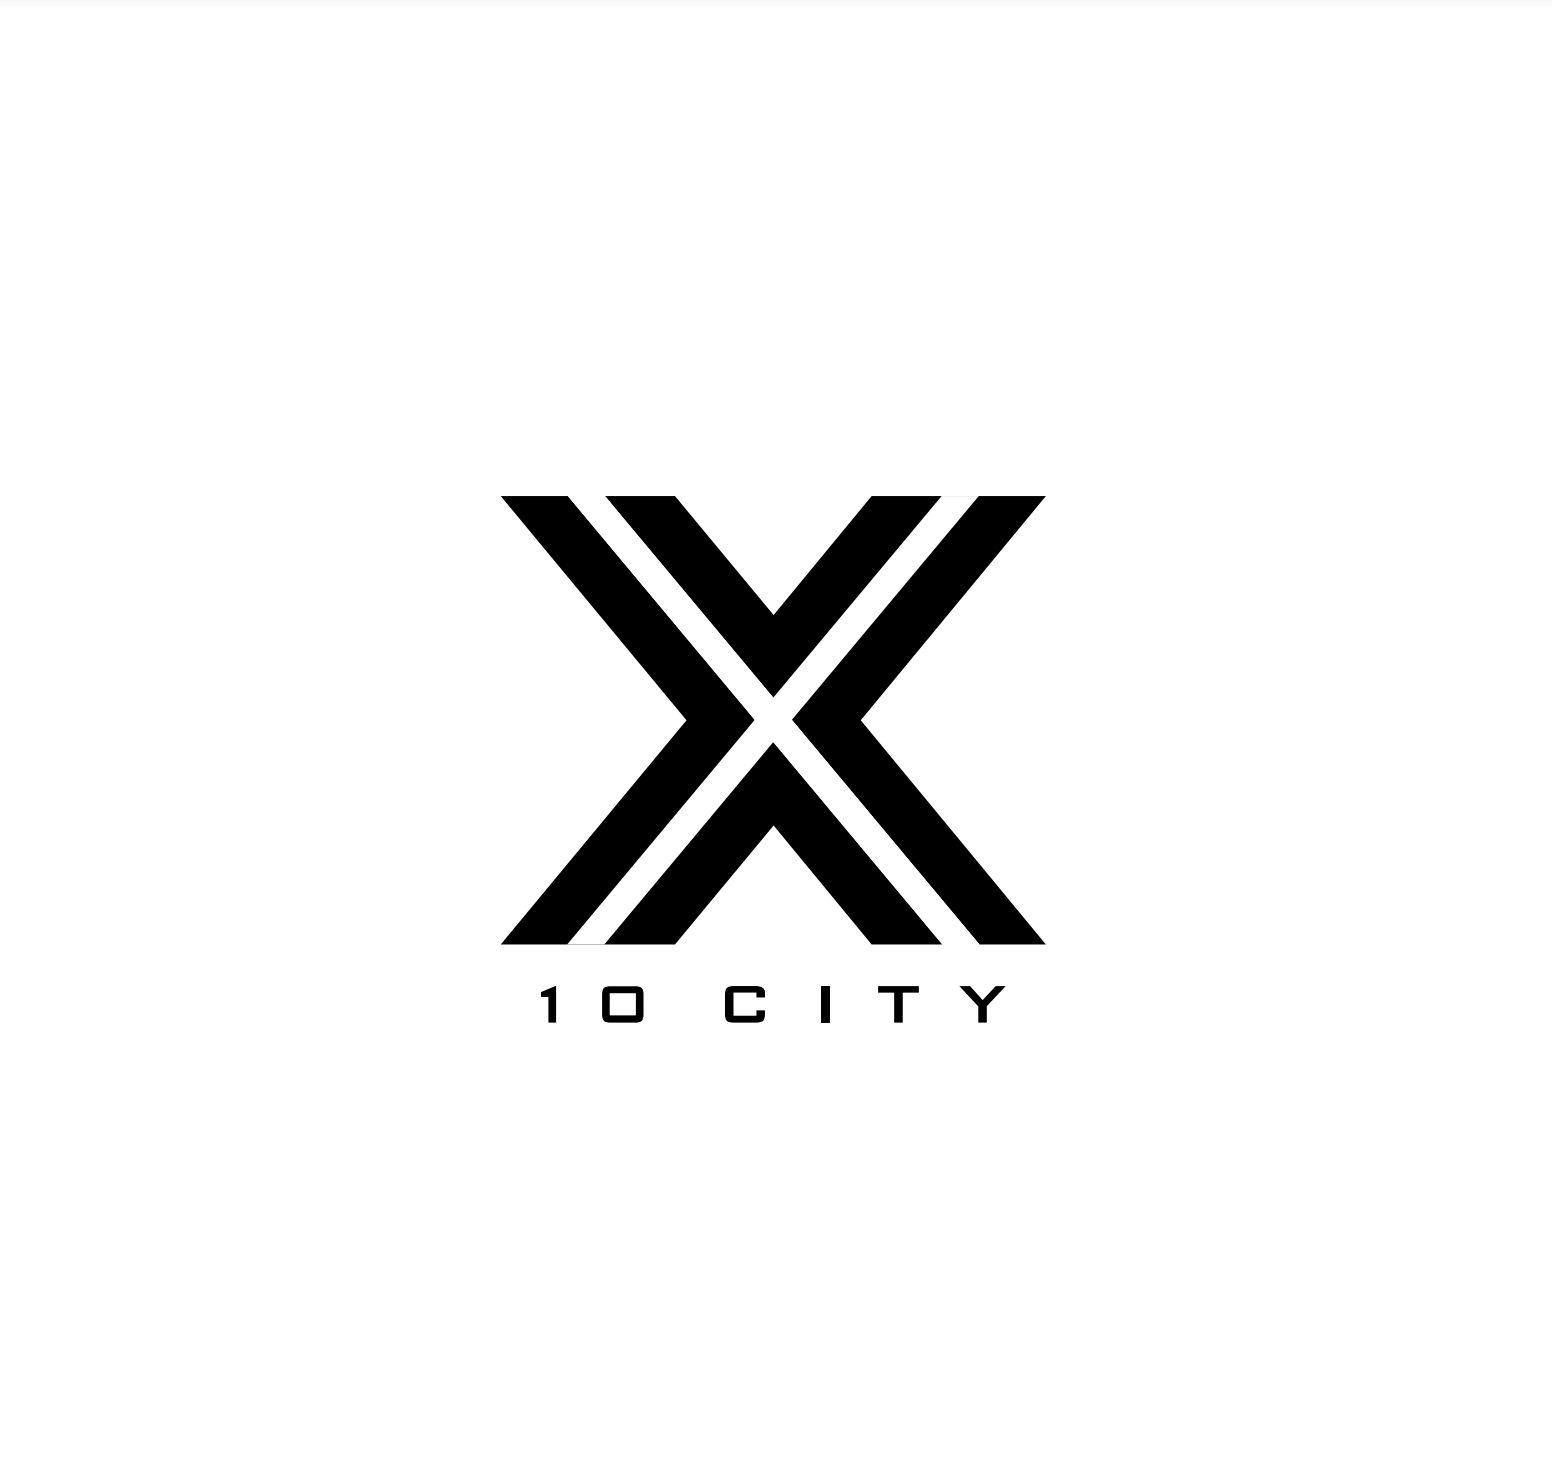 10 CITY